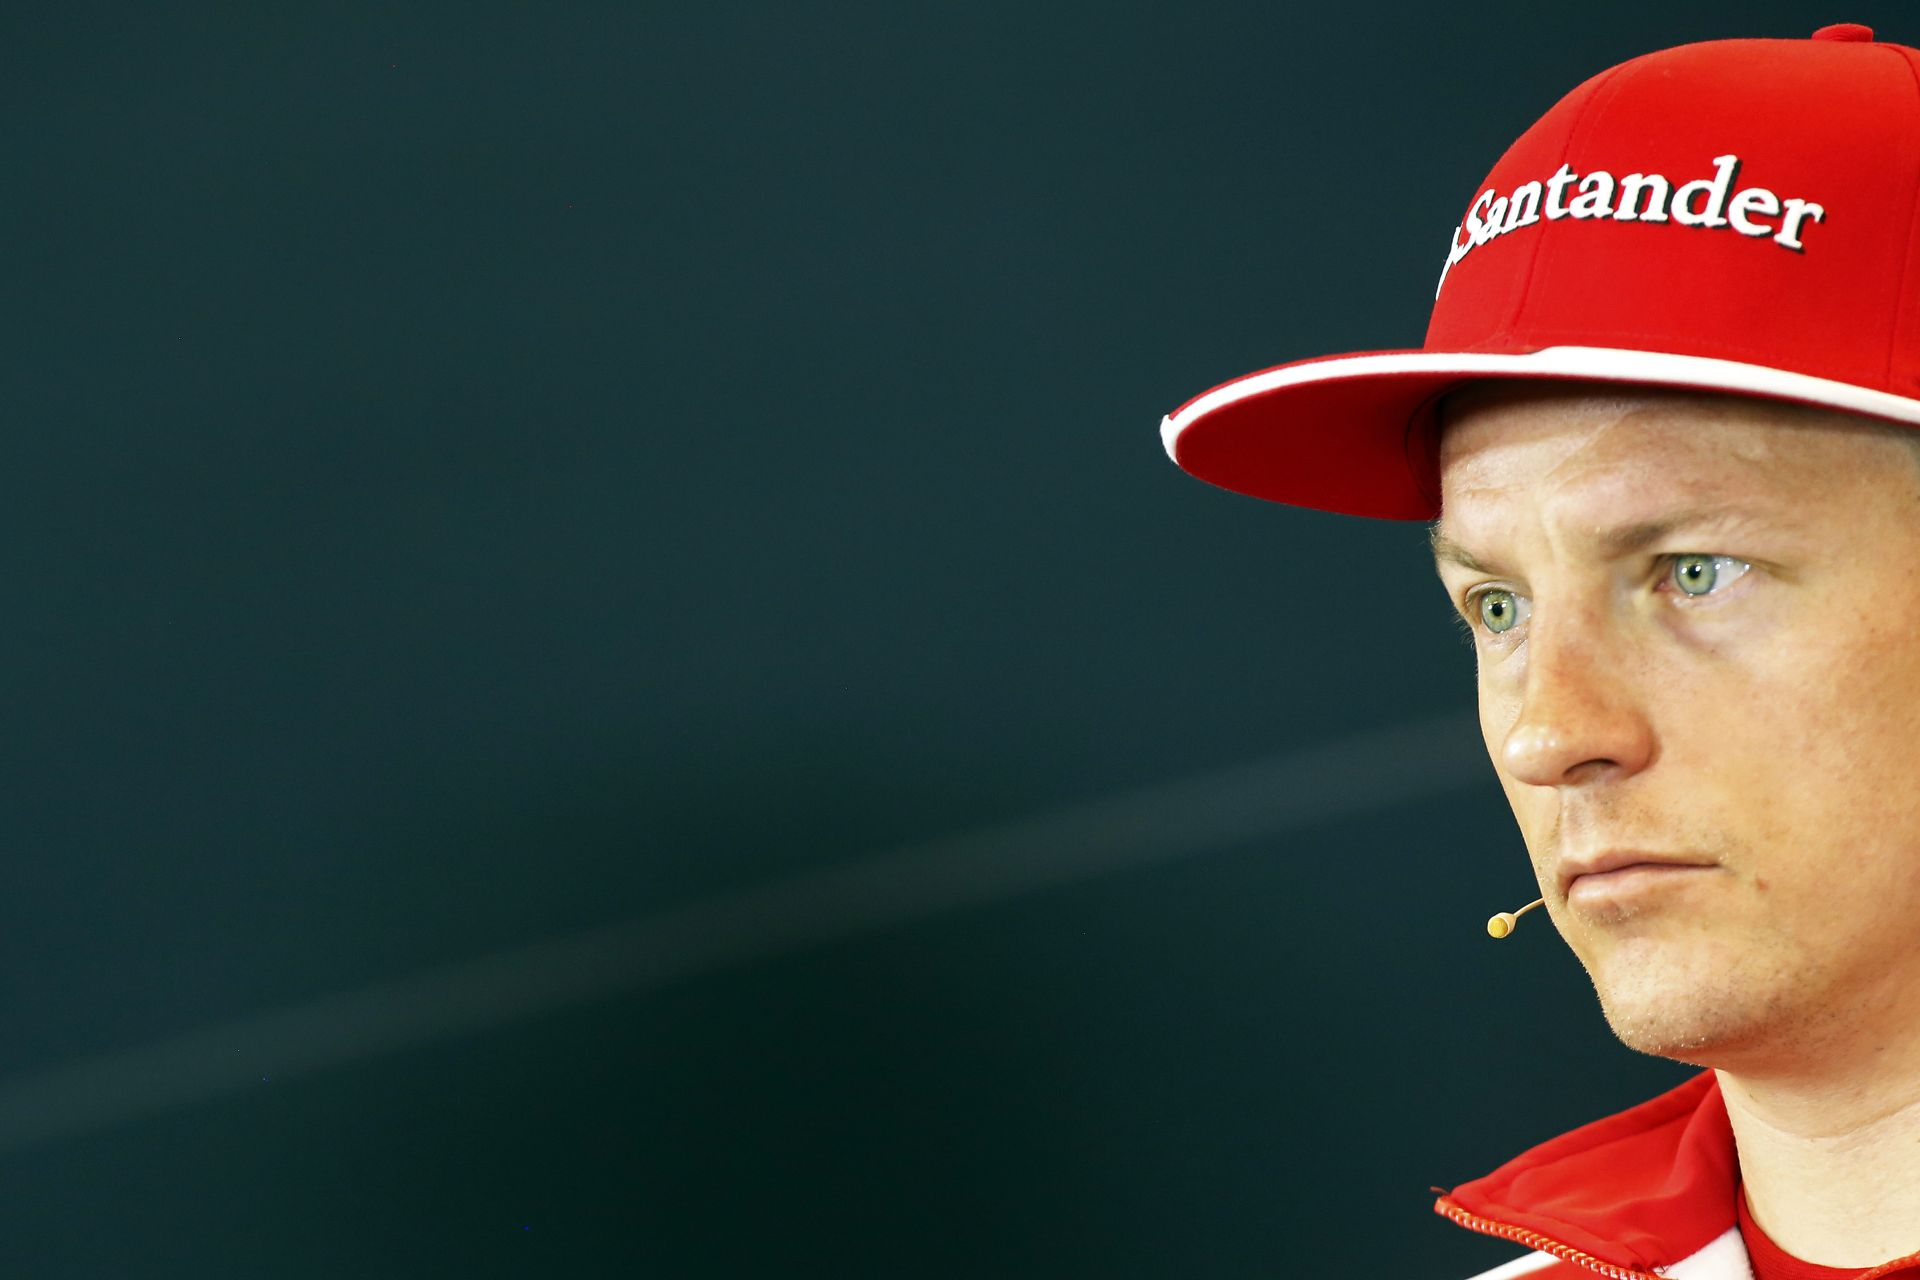 Räikkönen két napos versenyhétvégéket akar a Forma-1-ben!